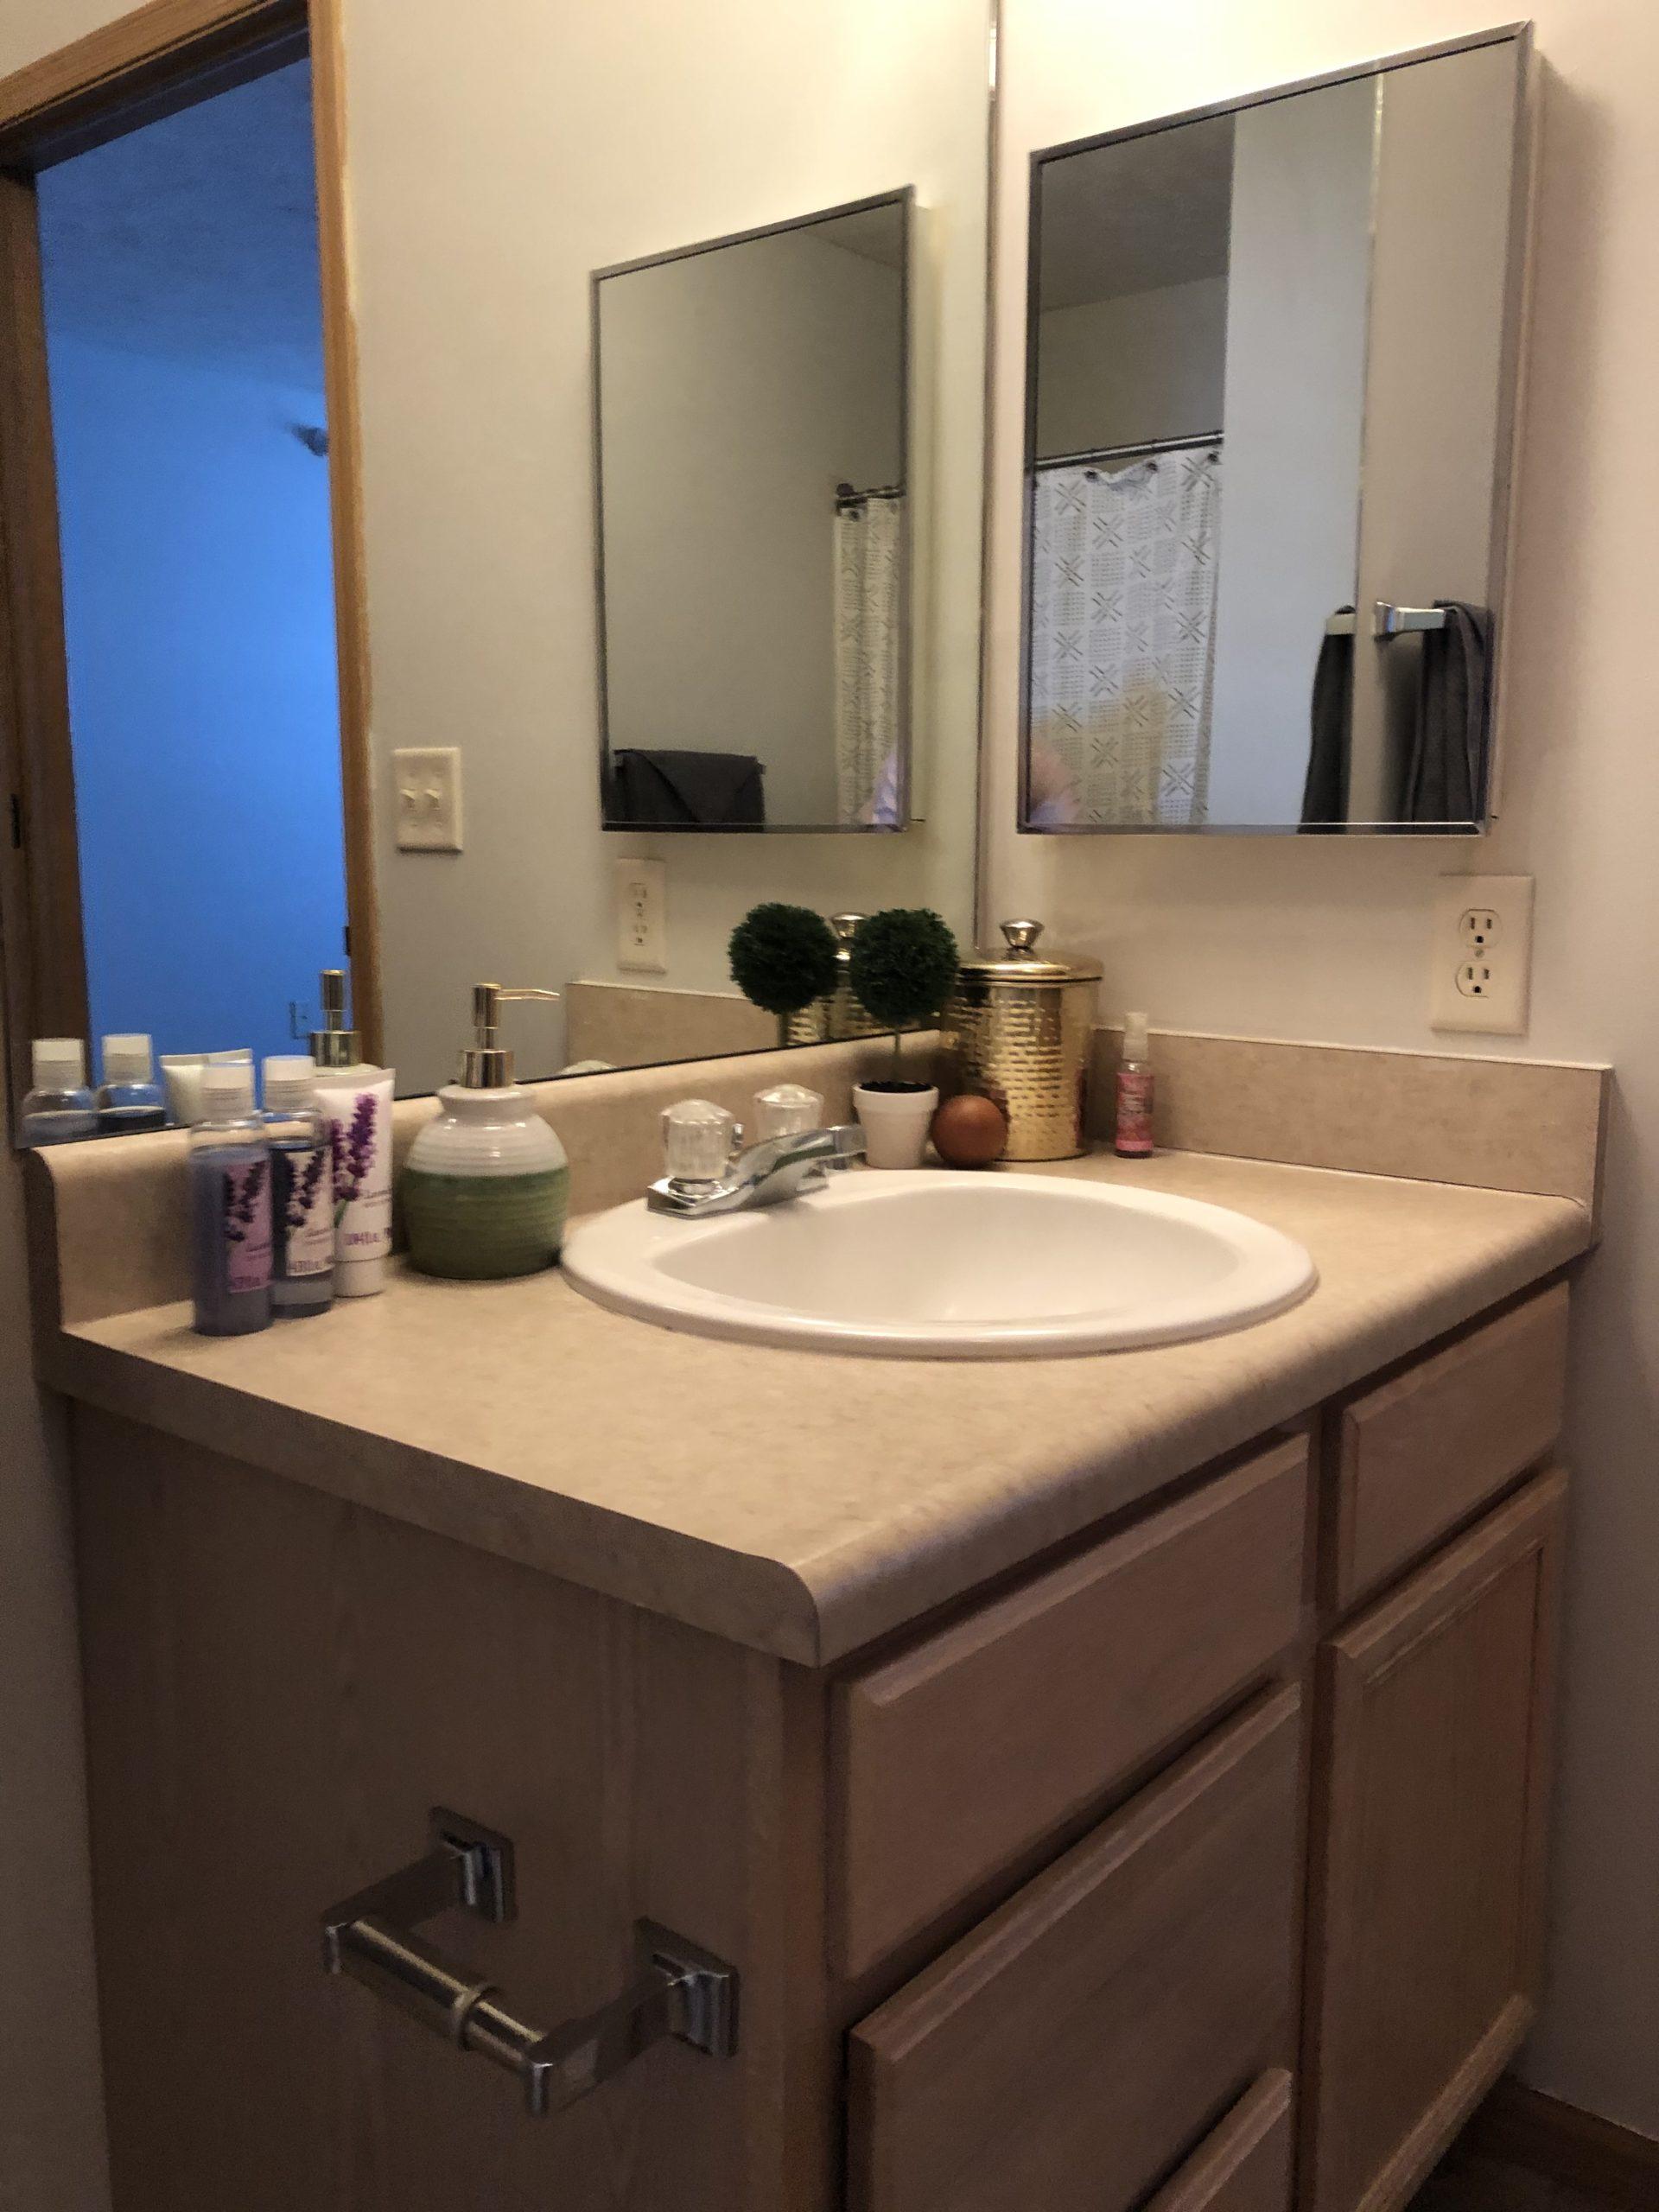 Tregaron Senior Residence Bellevue Nebraka bath 2